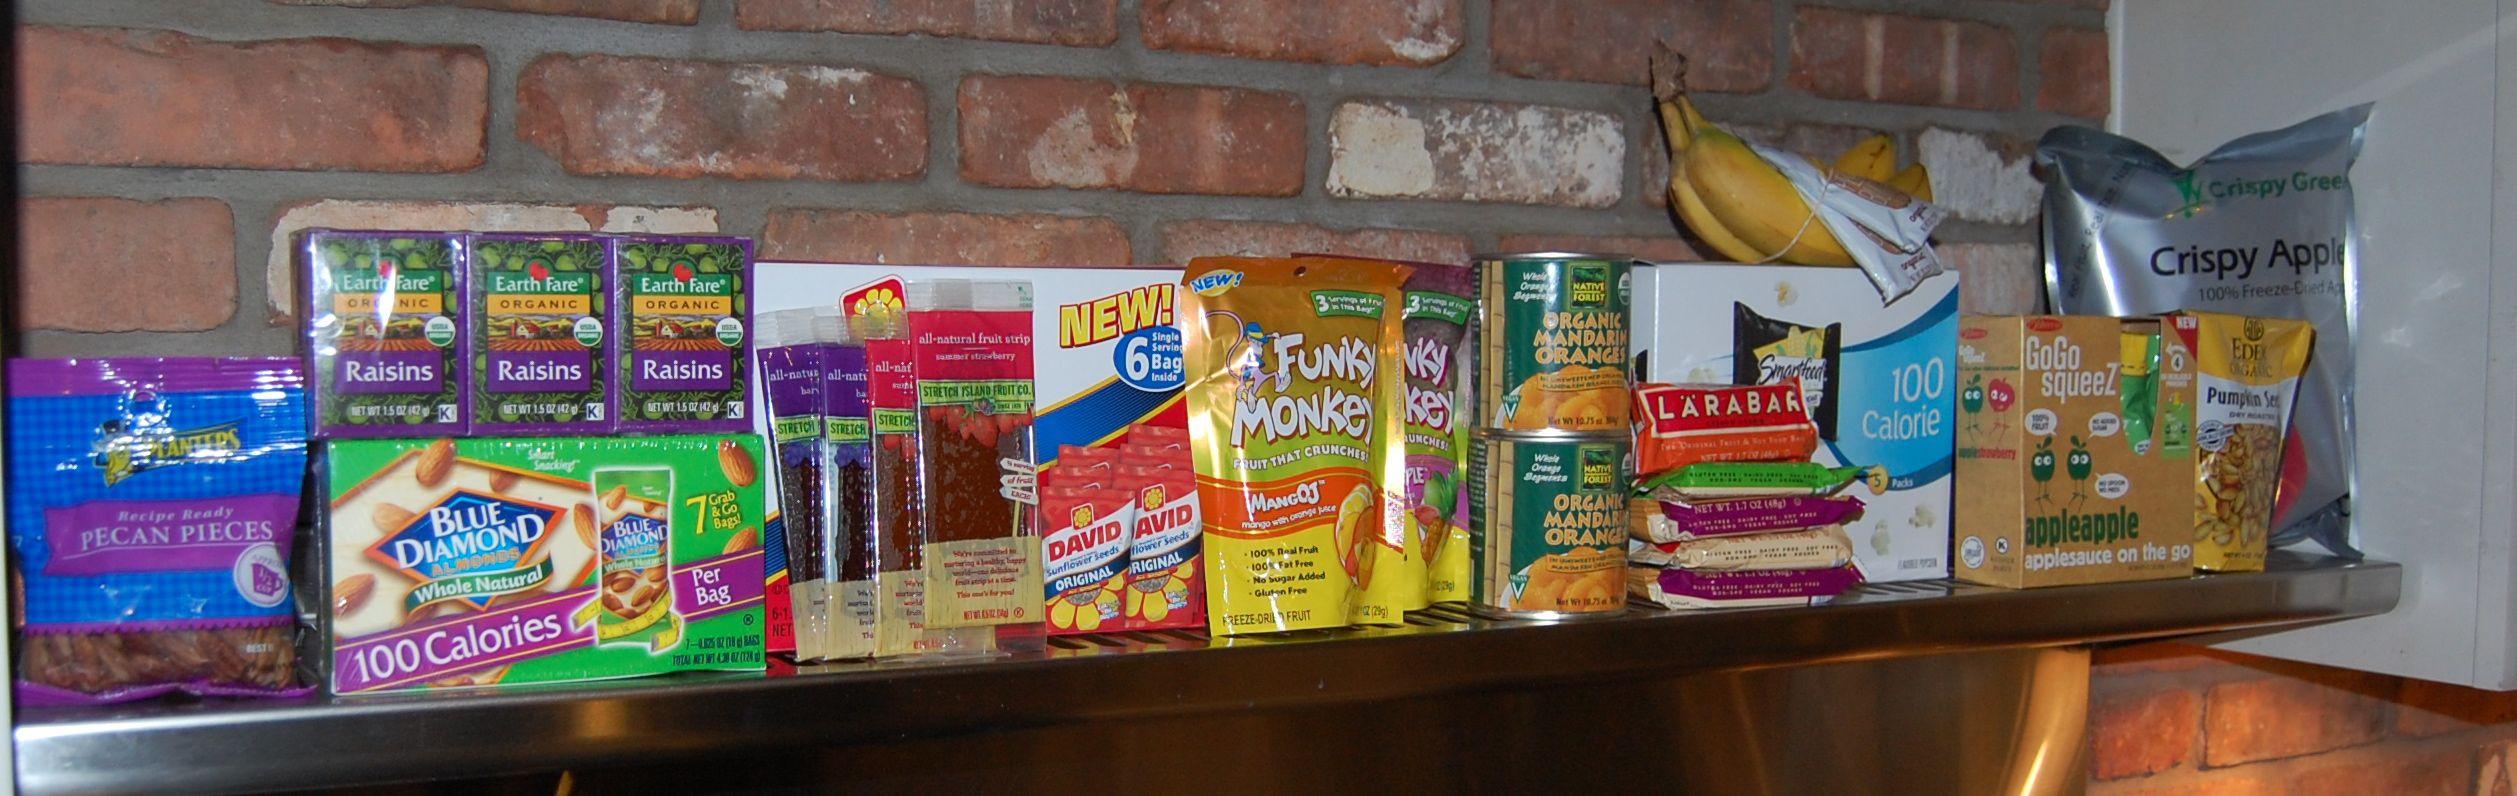 Healthy Prepackaged Lunches  Prepackaged Snacks for School